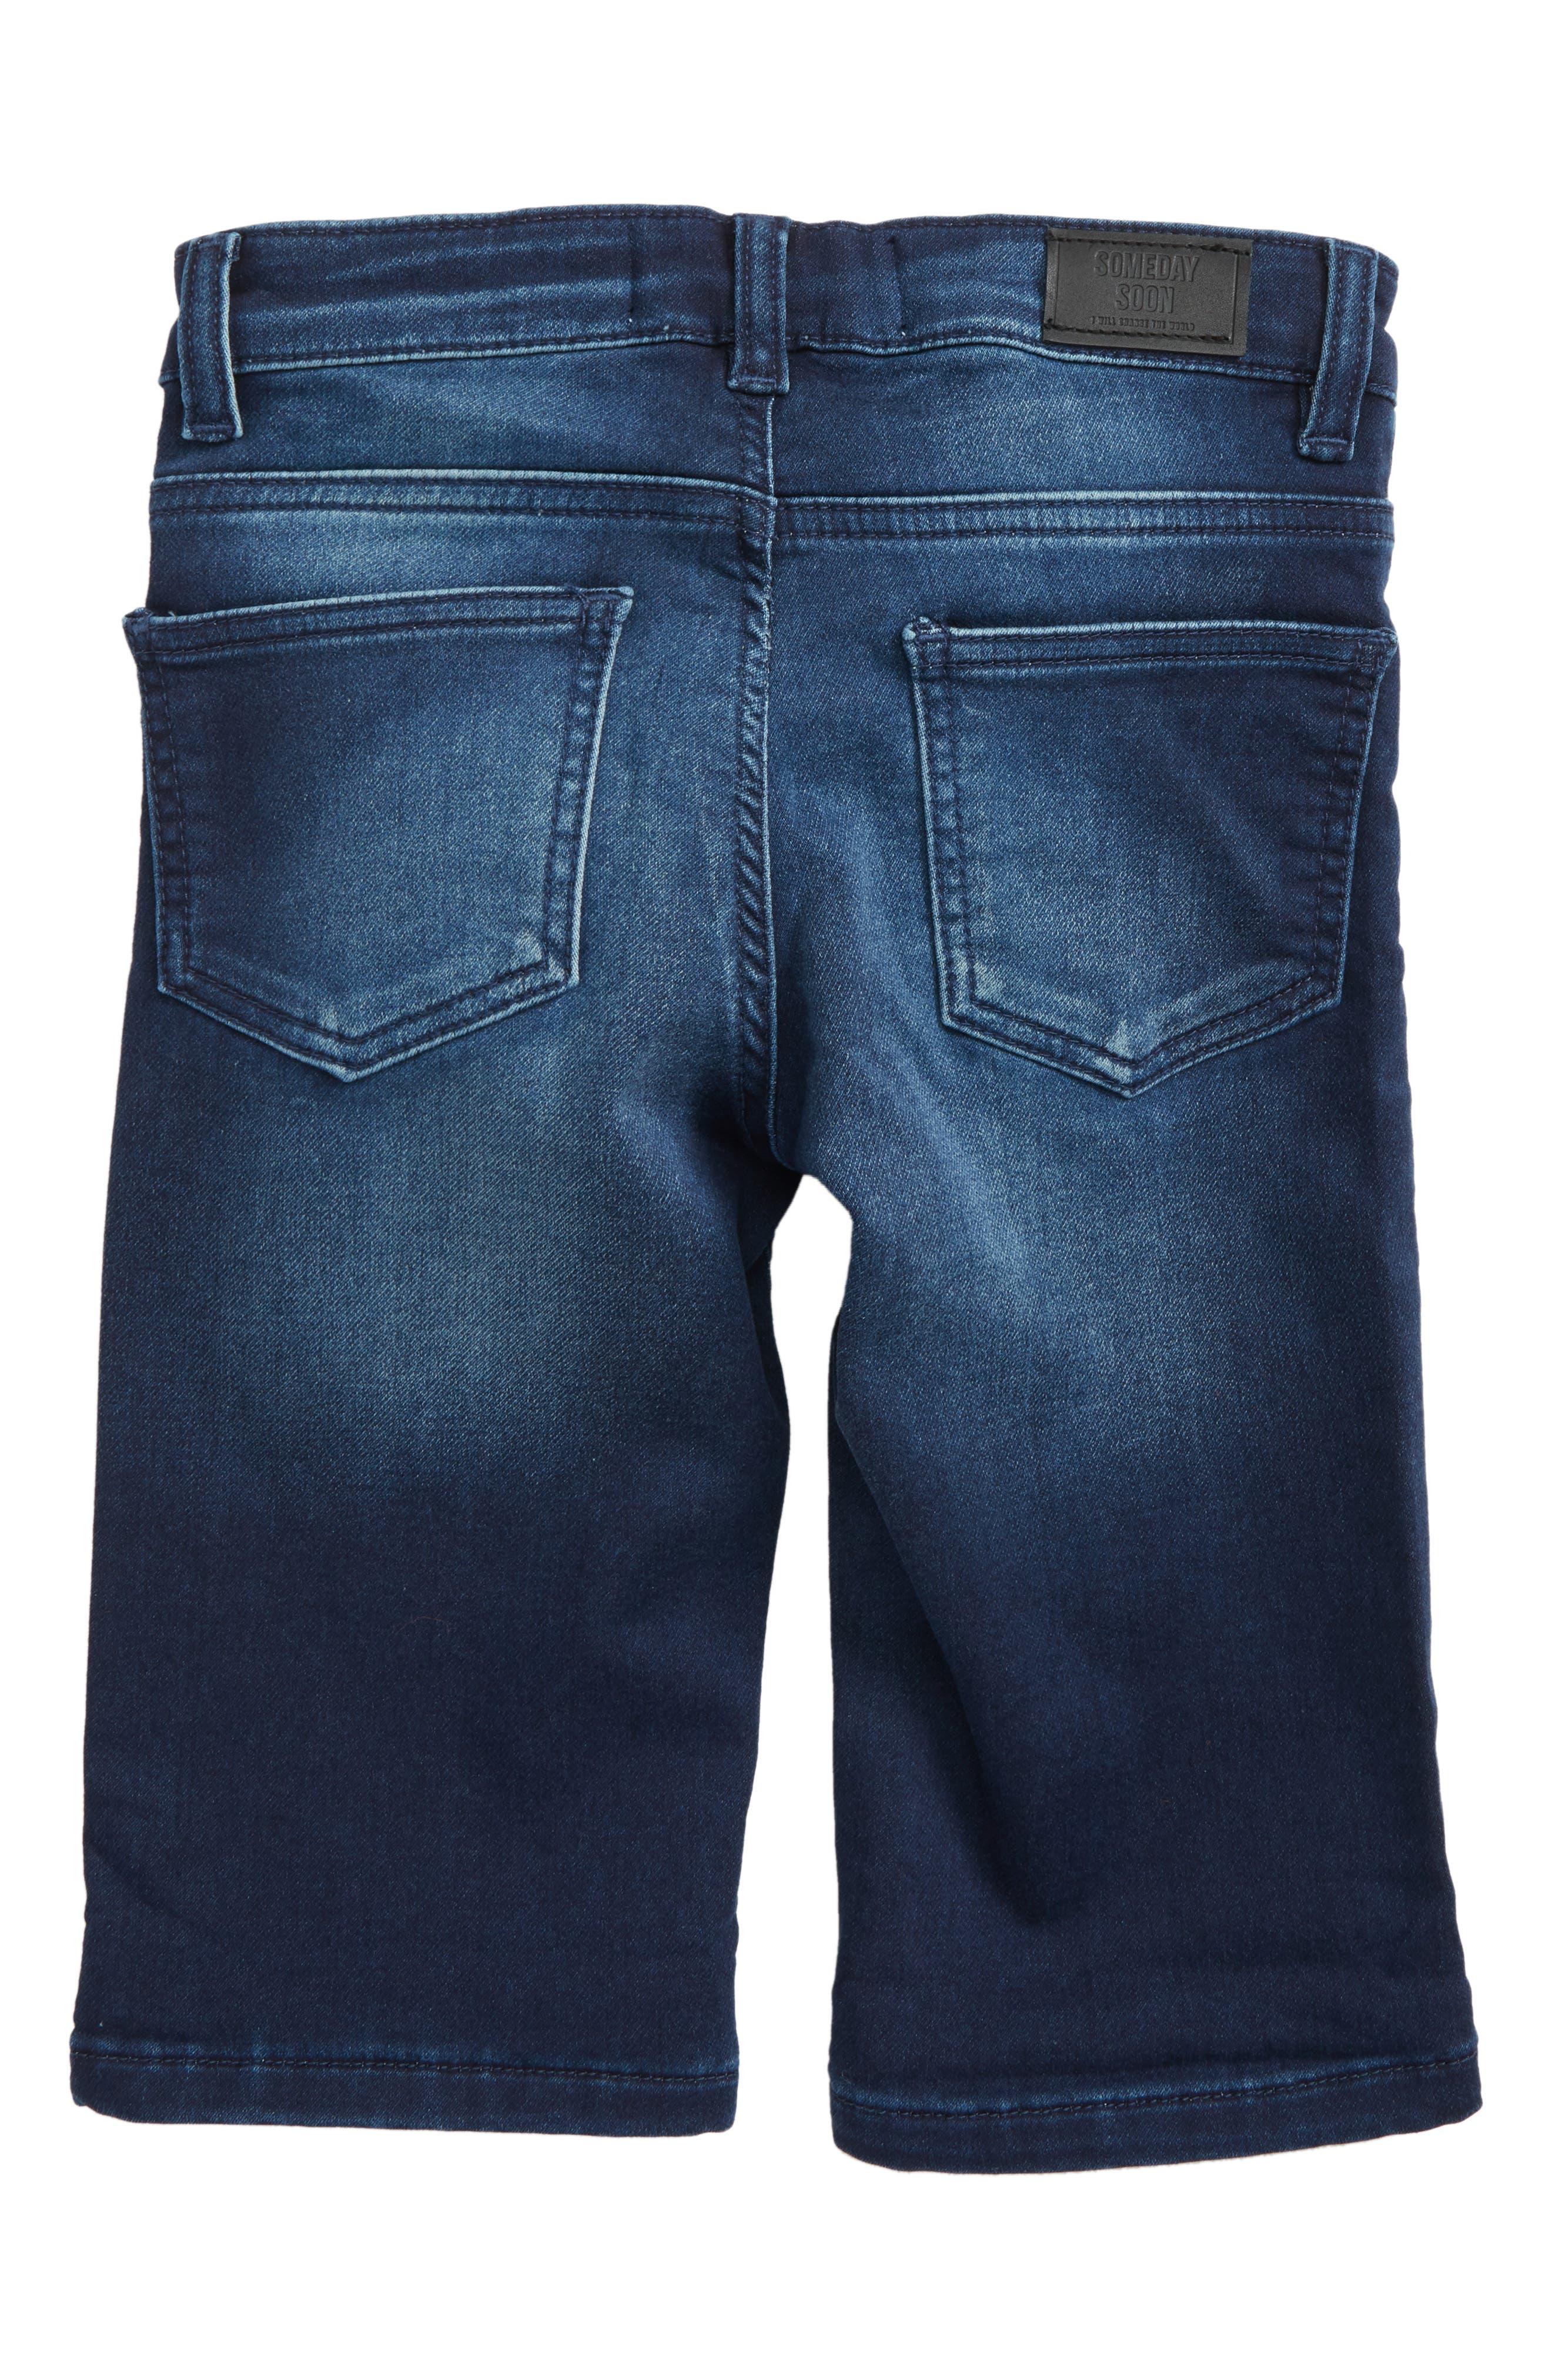 Carl Denim Shorts,                             Alternate thumbnail 2, color,                             Blue